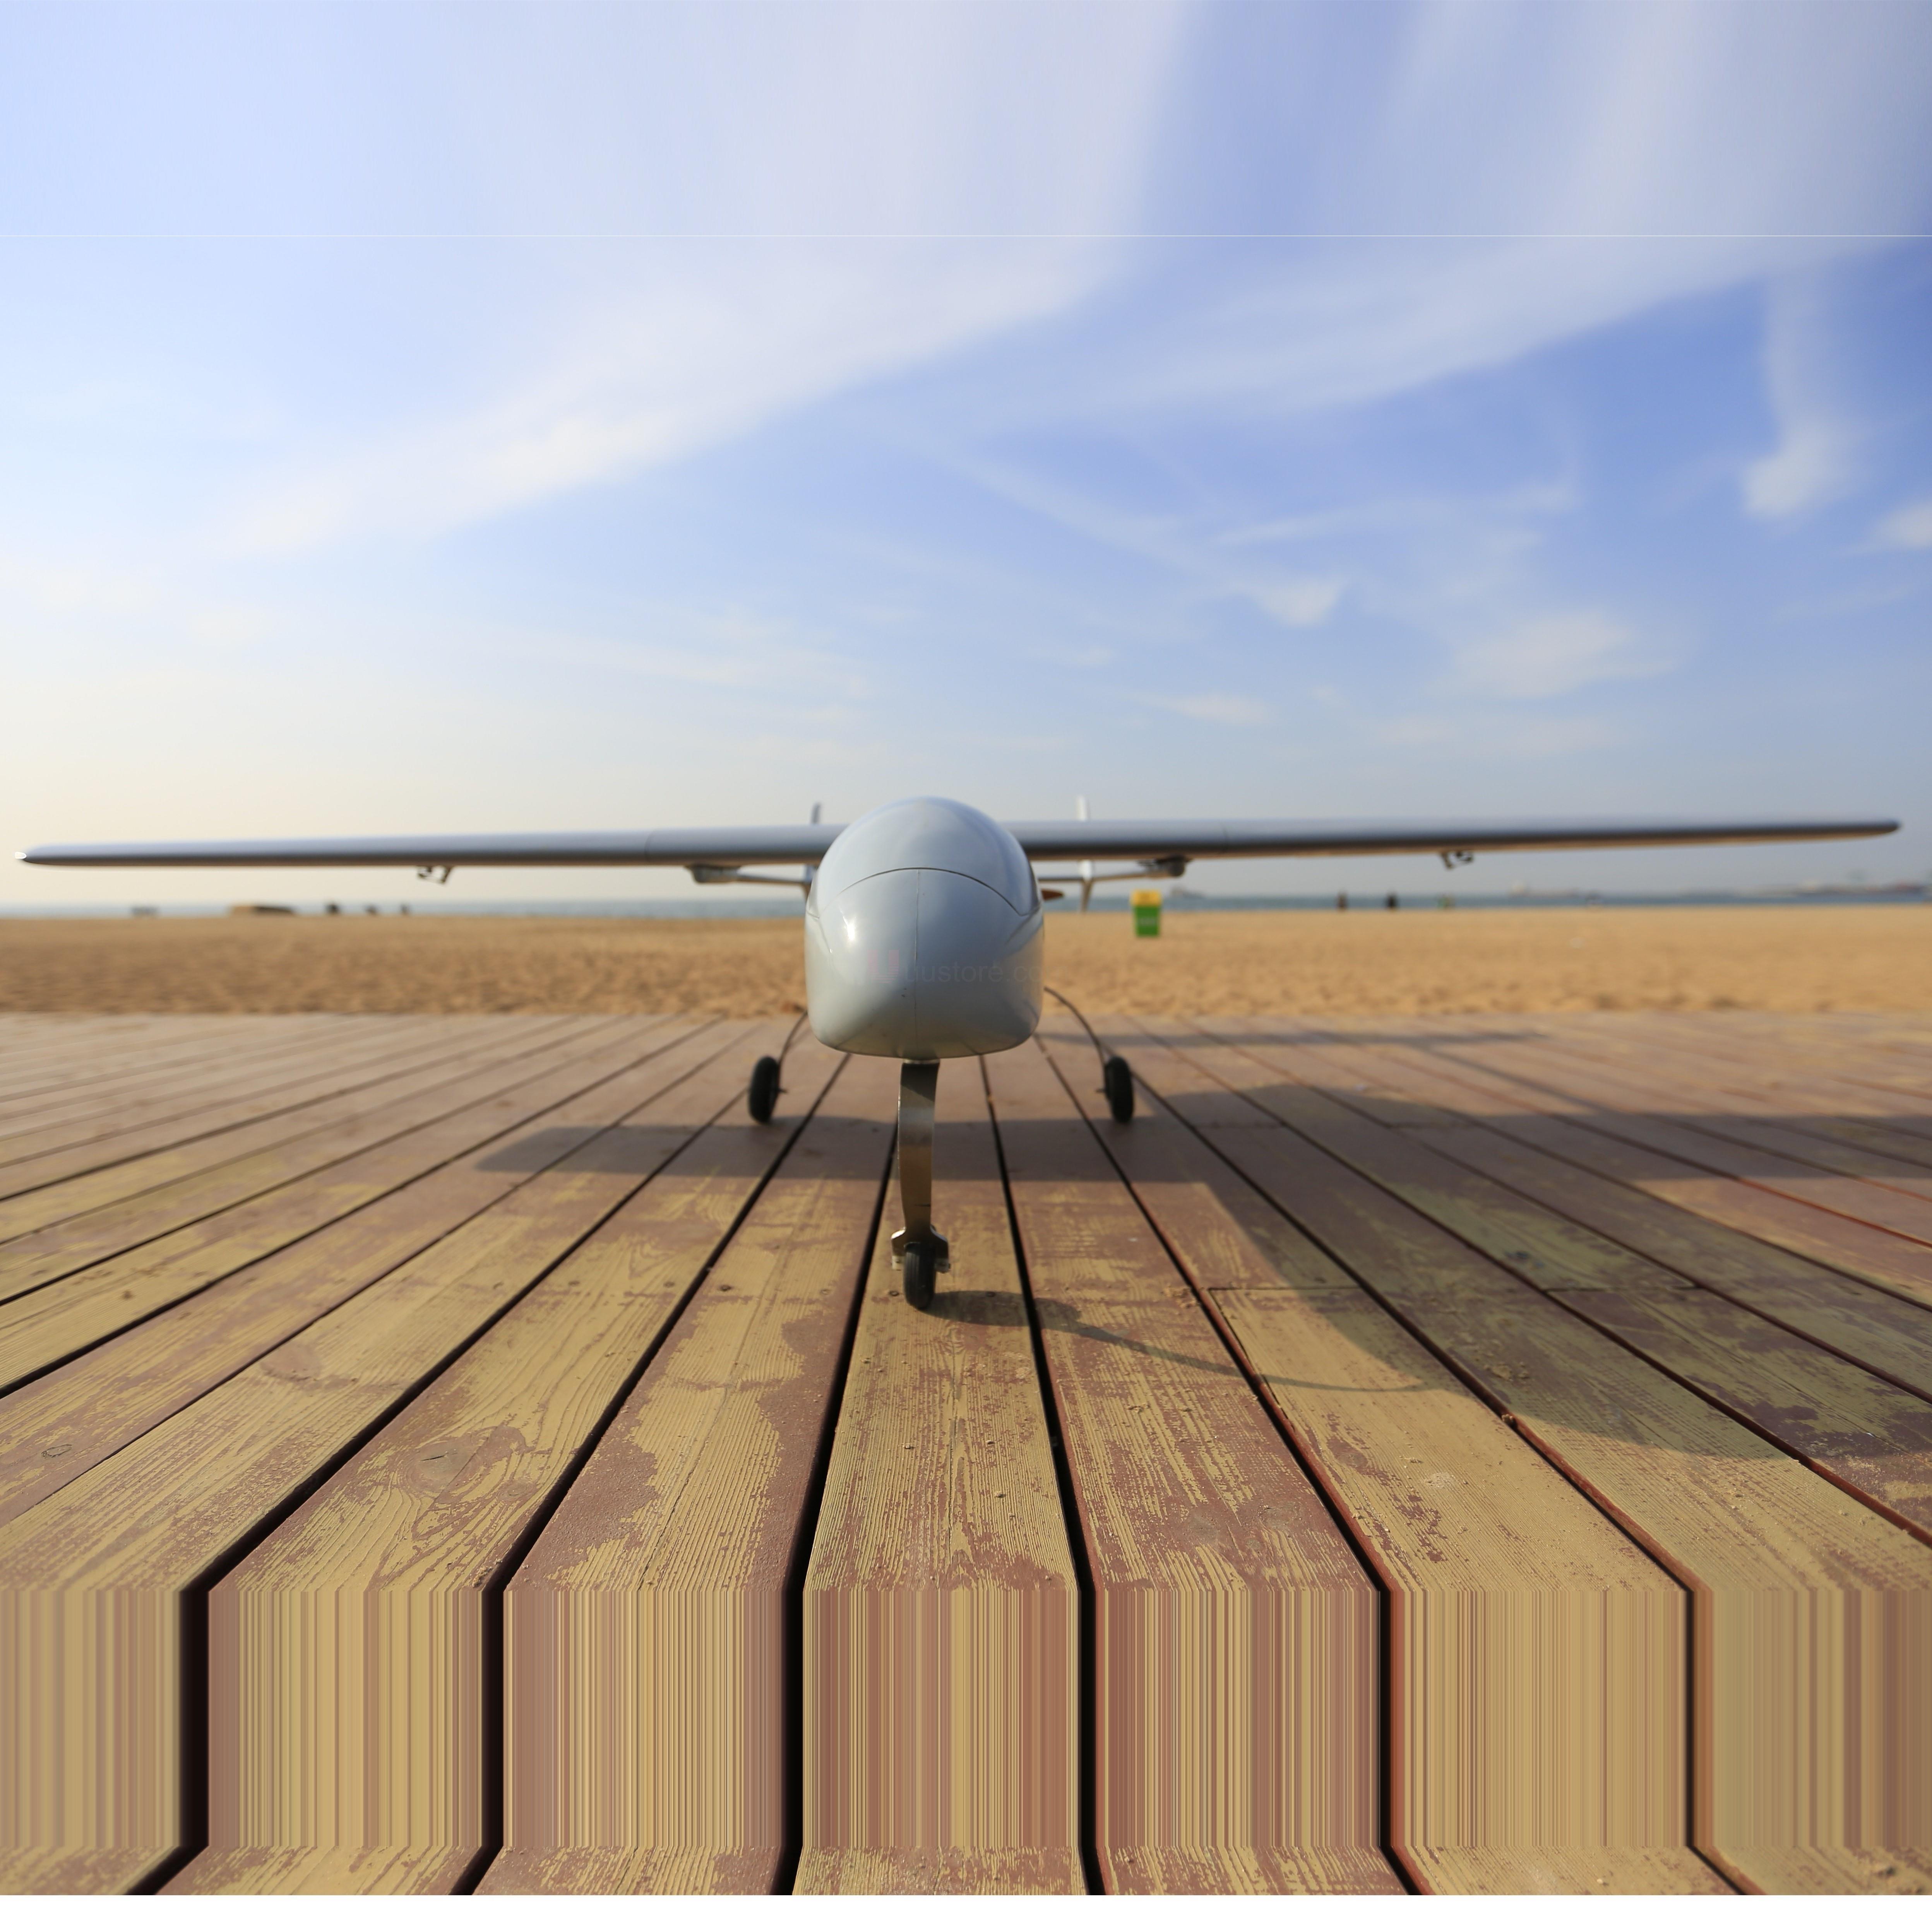 Mini Skyeye 2.6m UAV T tail platform carbon fiber Tail Suit Requirement 30-35cc <font><b>engine</b></font> <font><b>RC</b></font> Airplane Kit Plane